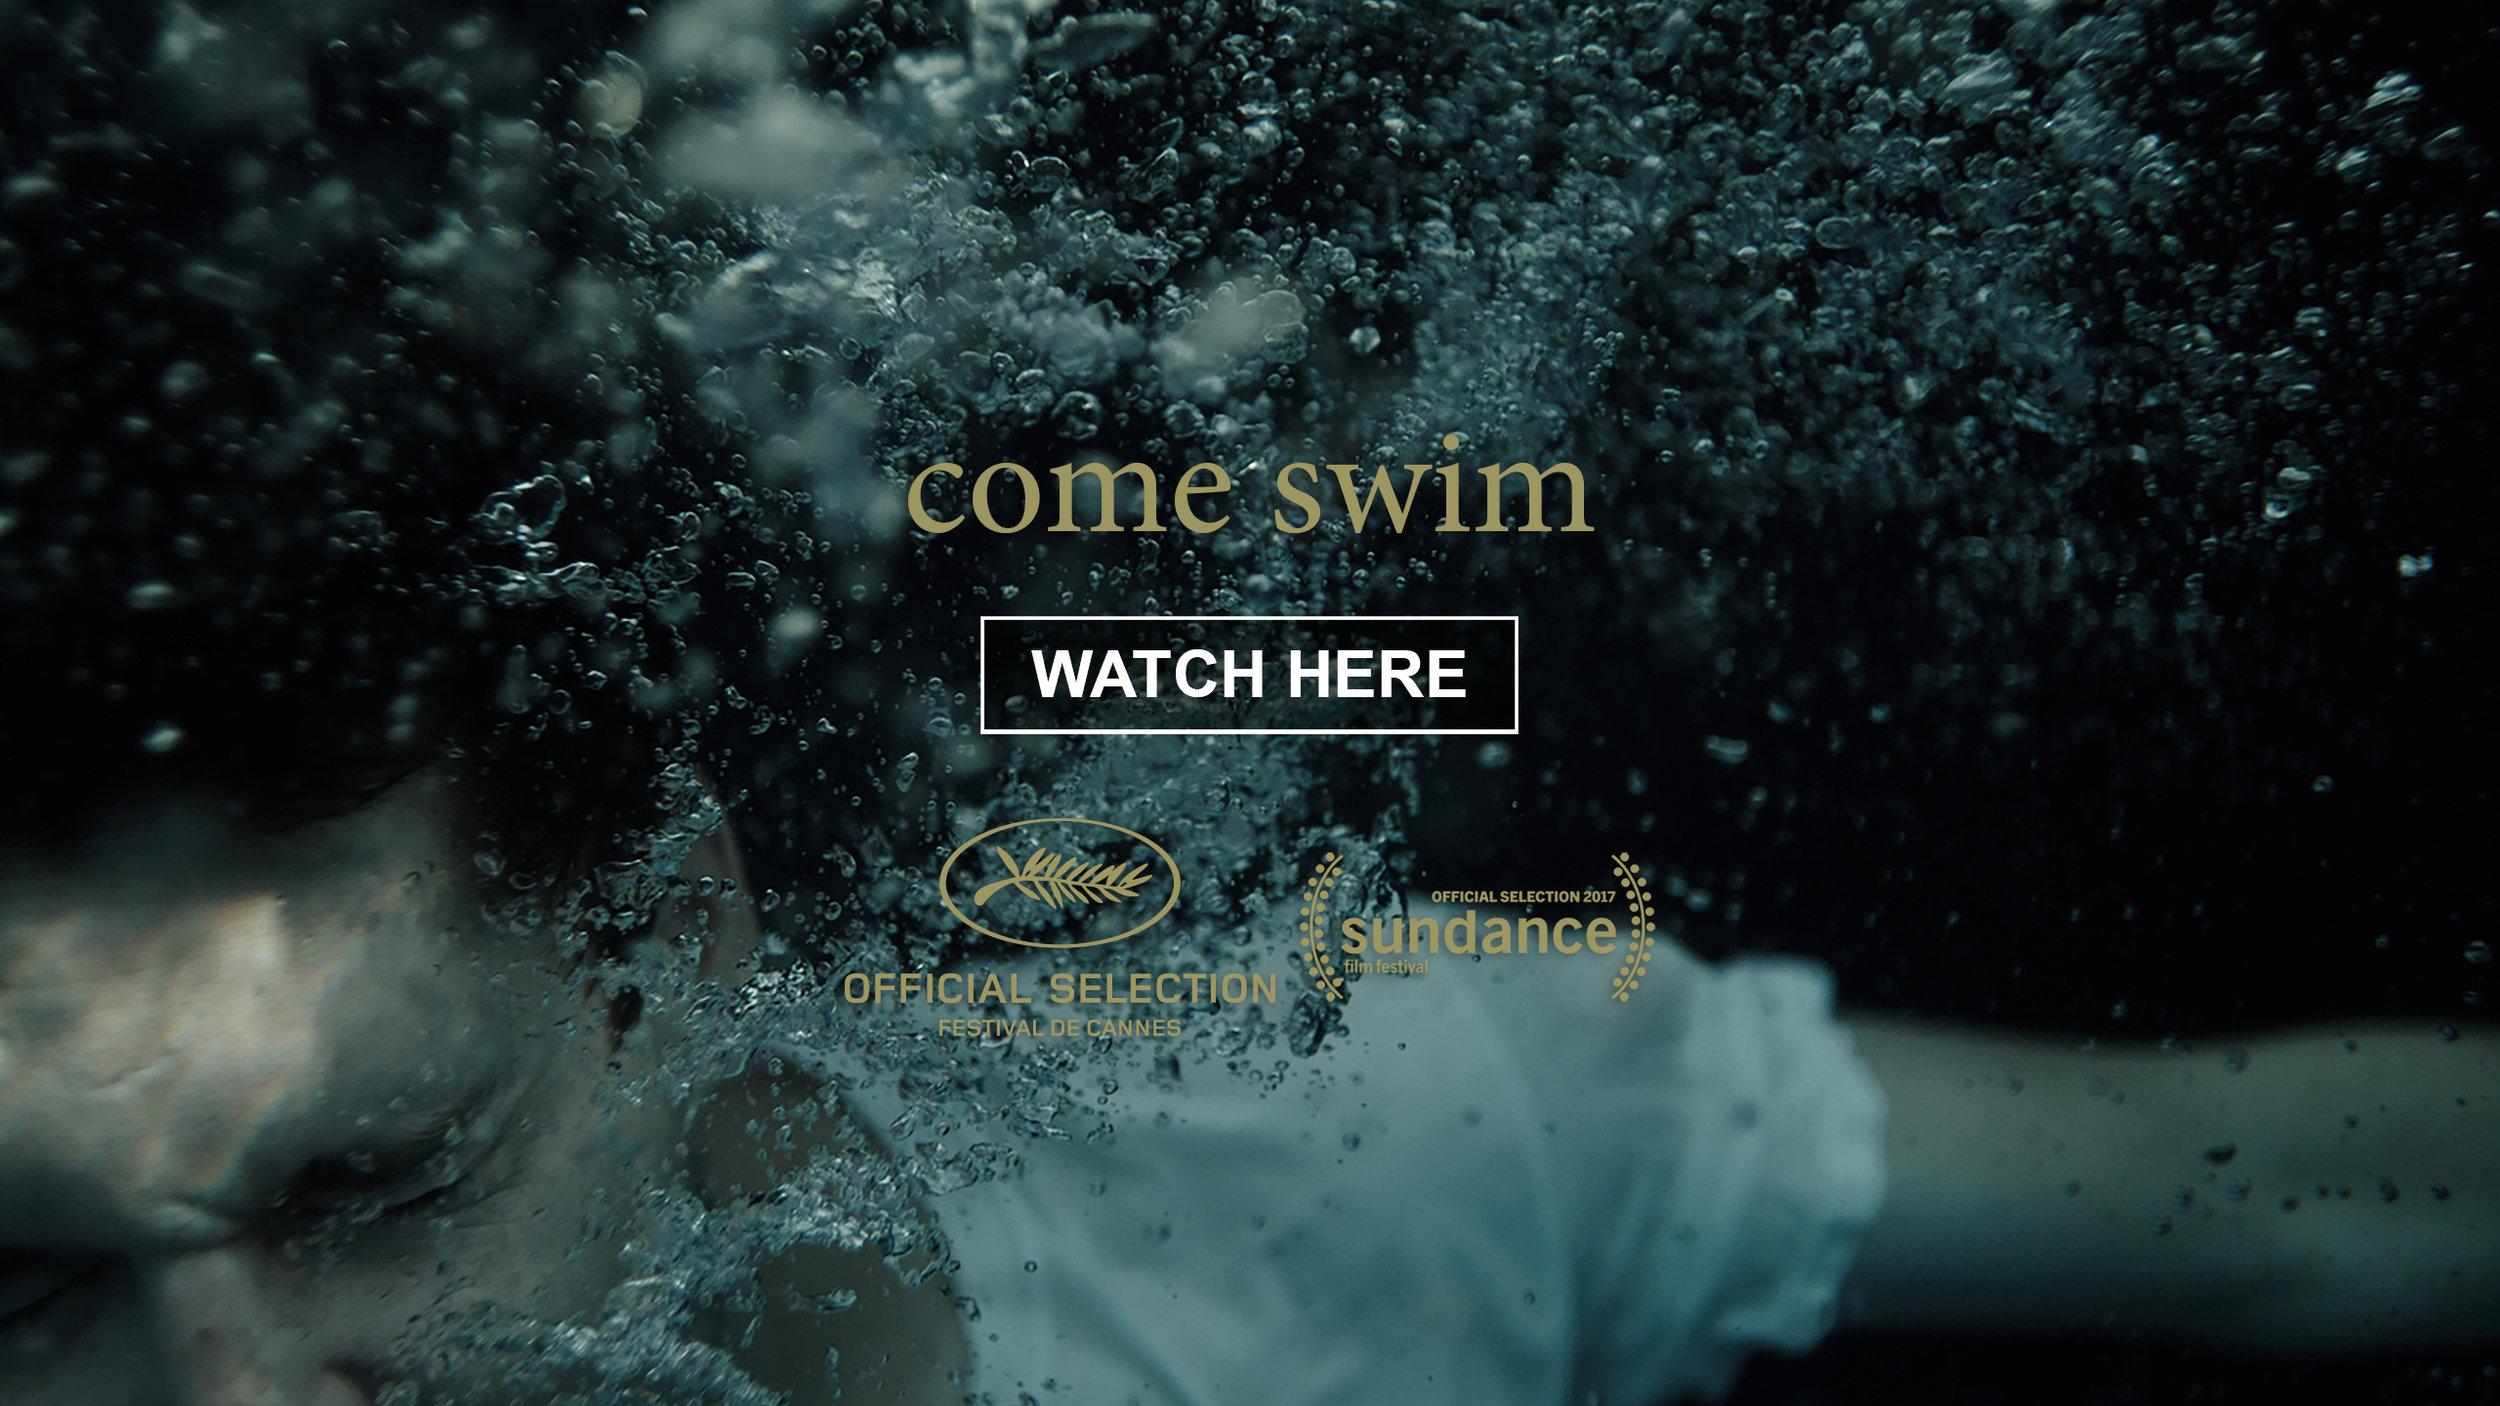 Come Swim (Come Swim WATCH HERE)1.jpg